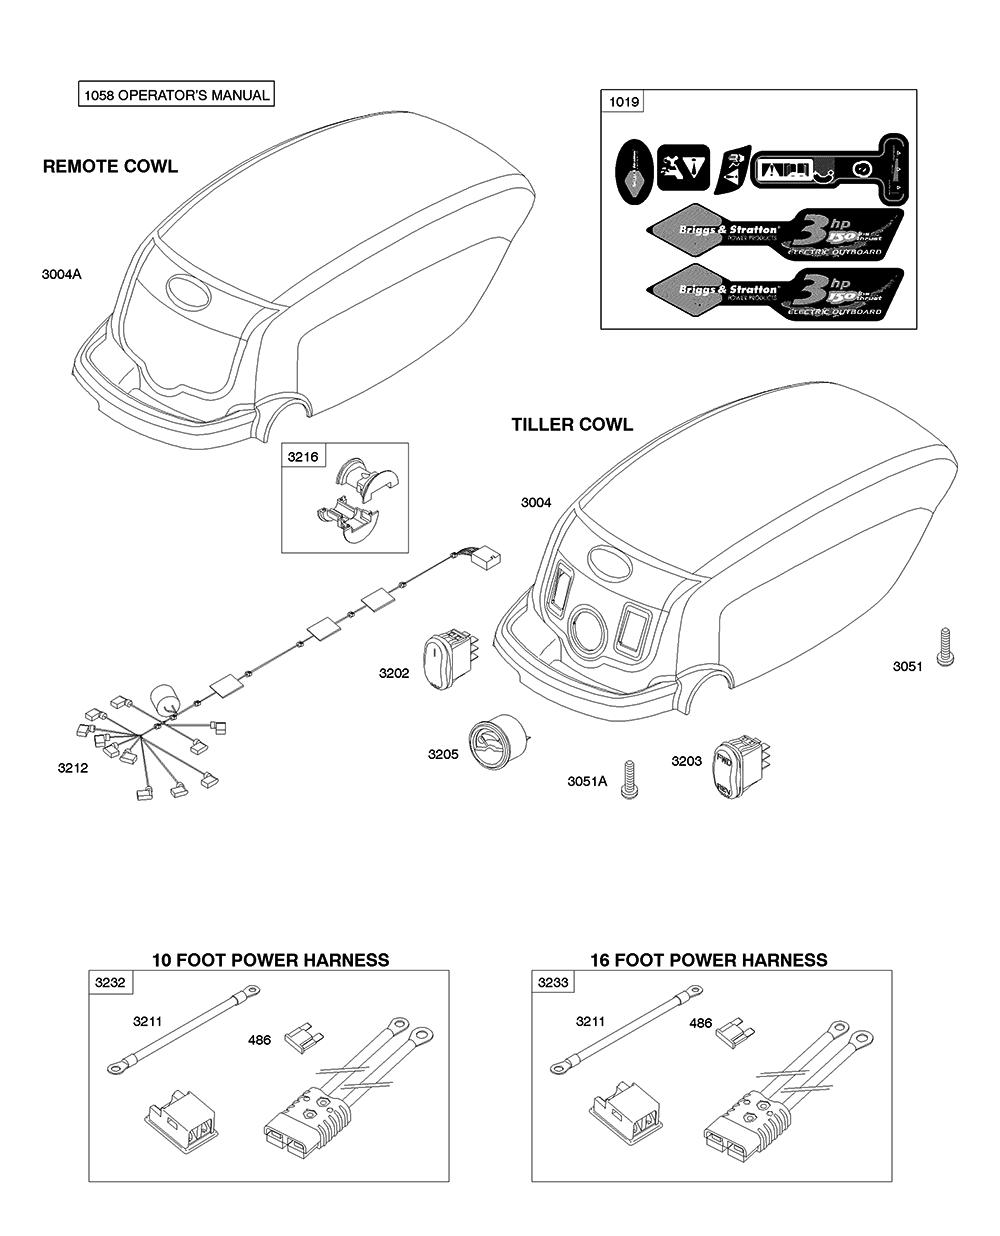 AA0202-(5101)-BriggsandStratton-PB-1Break Down